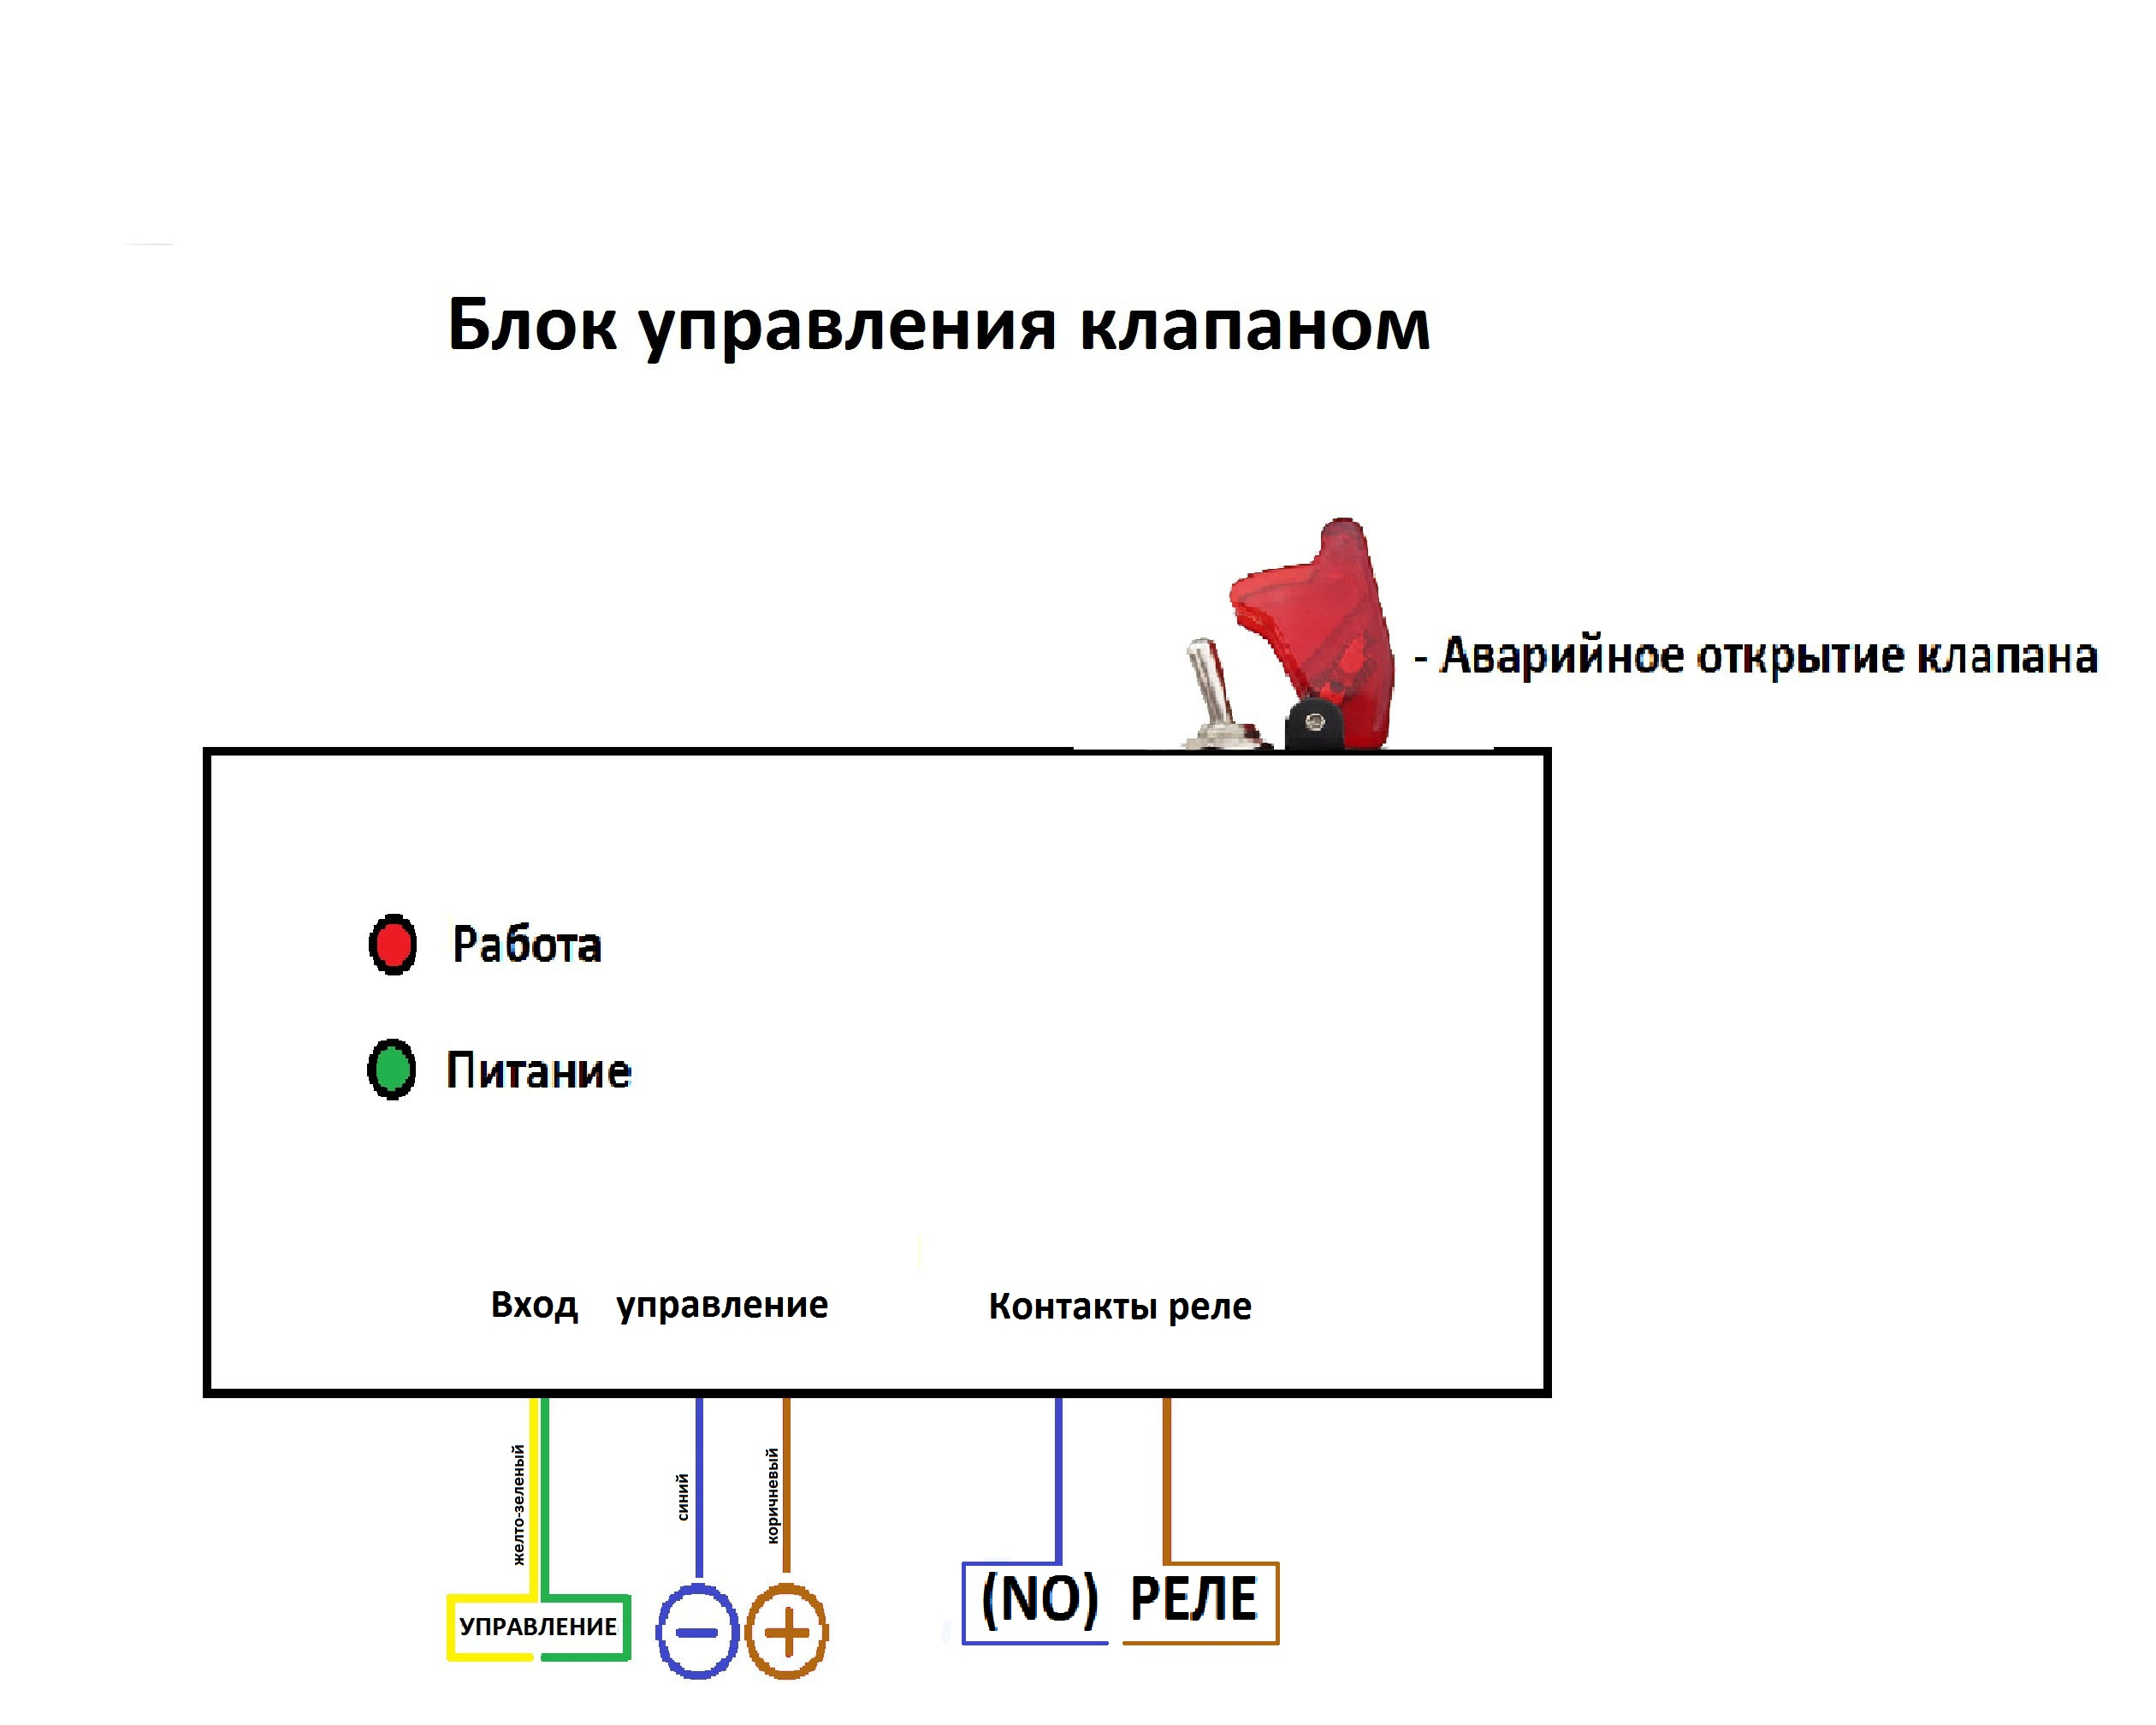 blok_upravleniya_klapanom_shema